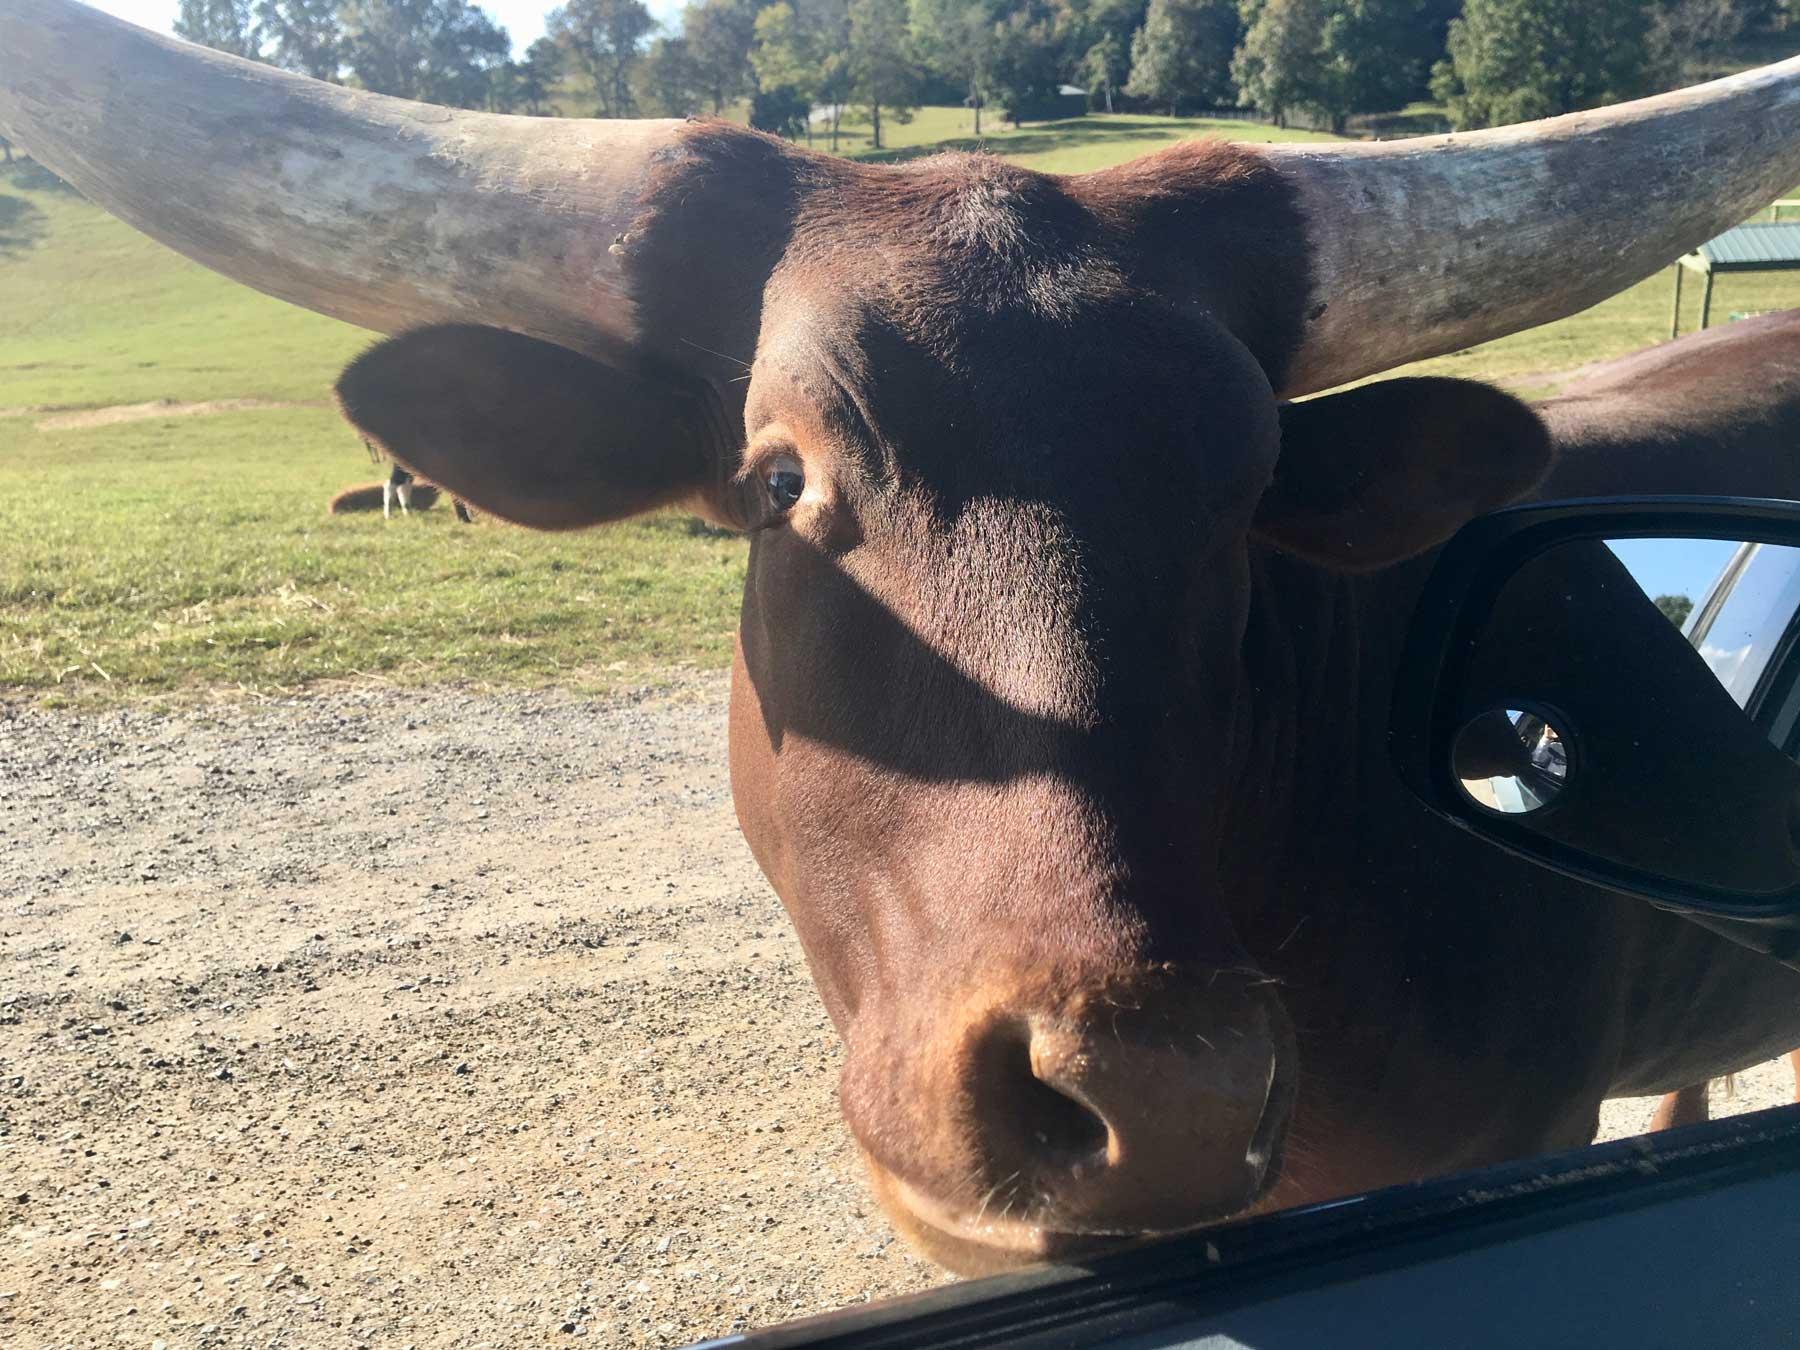 Long-horned cow at car's window at Virginia Safari Park, Natural Bridge, VA